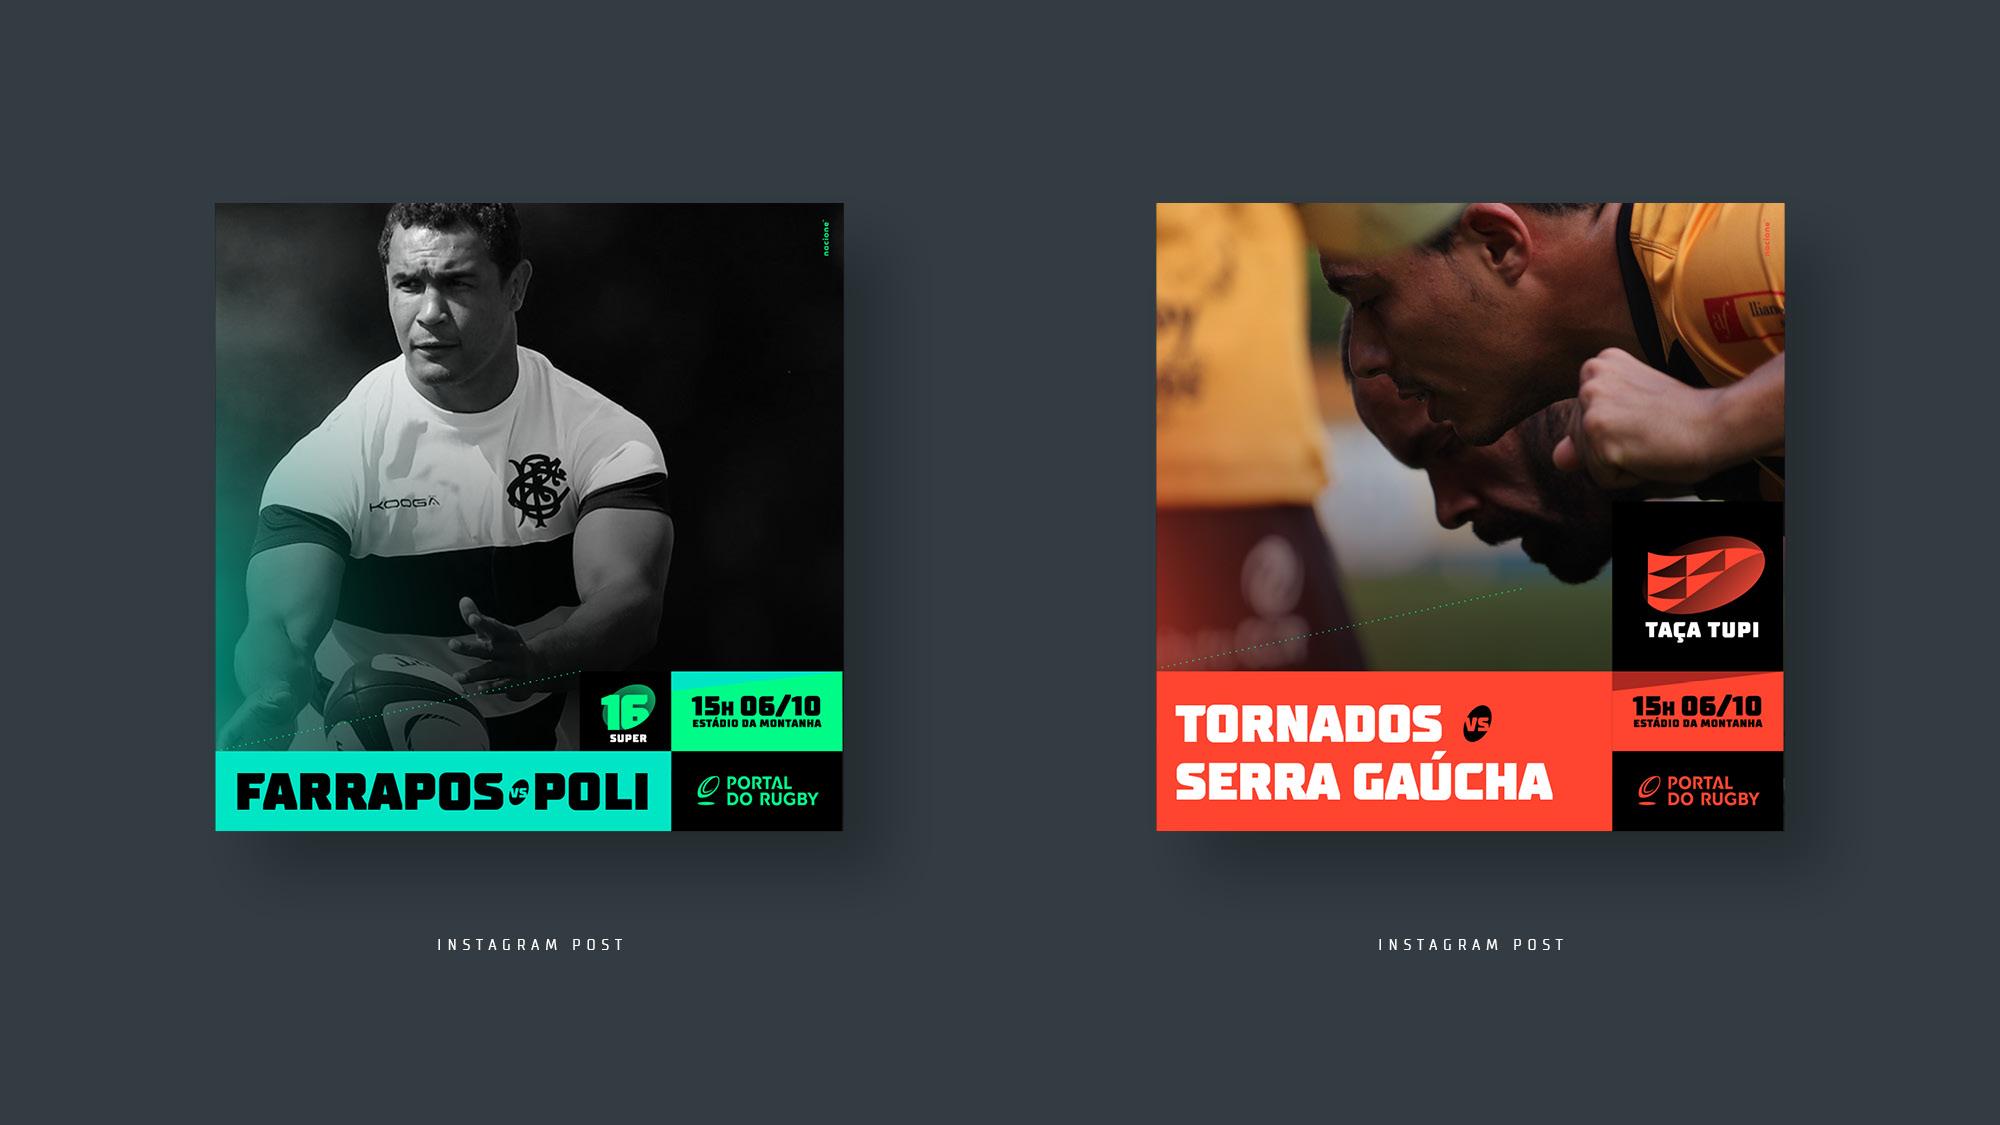 Nacione-Branding-Portal-do-Rugby35